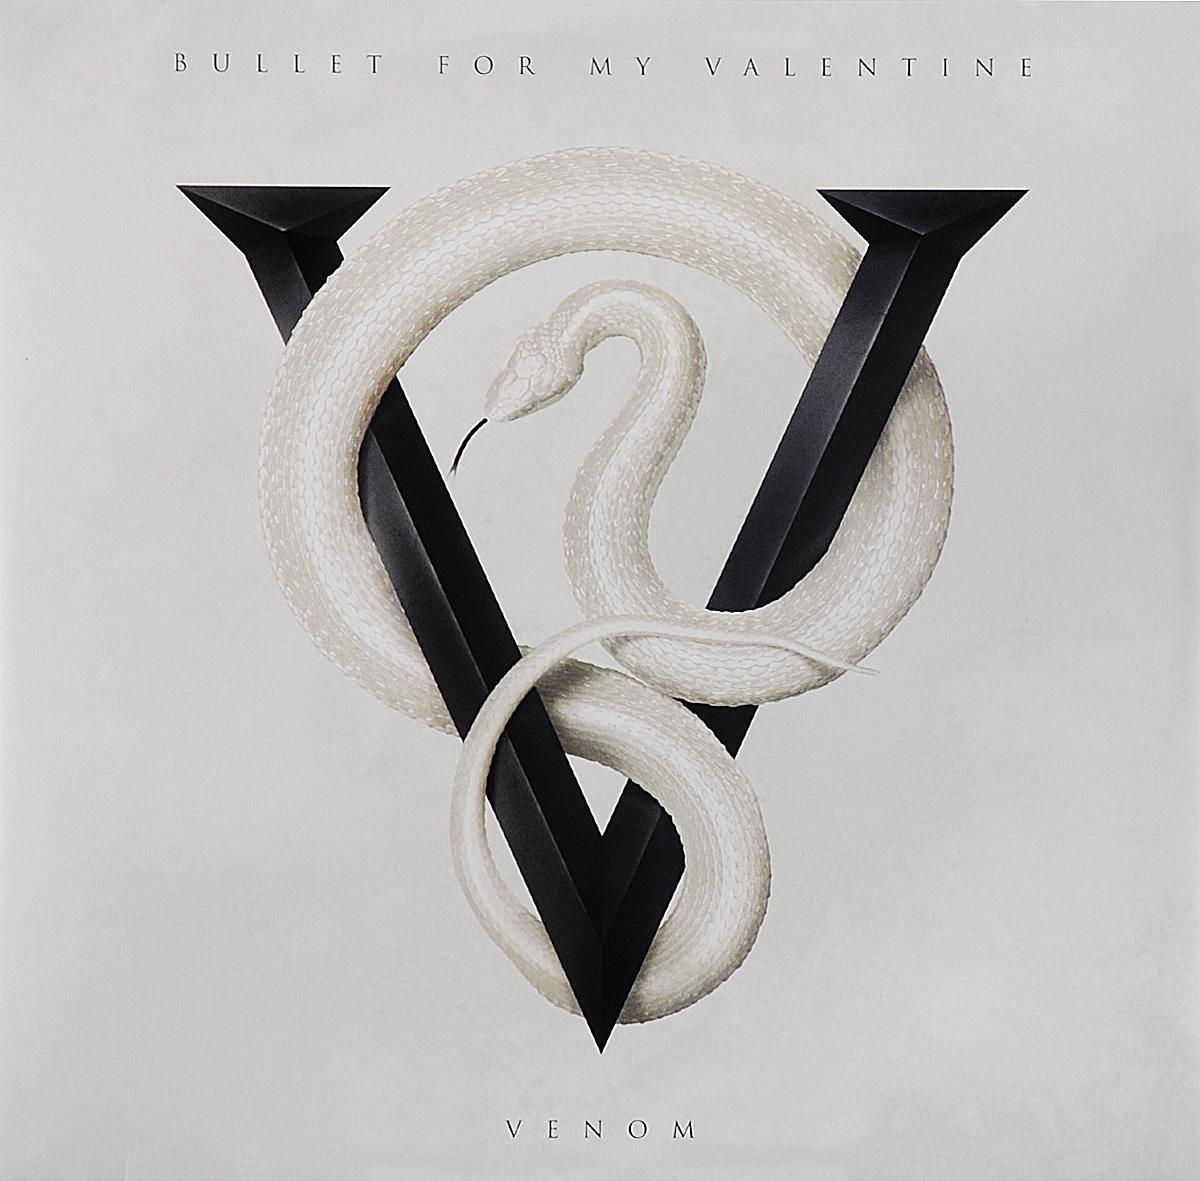 цена на Bullet For My Valentine Bullet For My Valentine. Venom